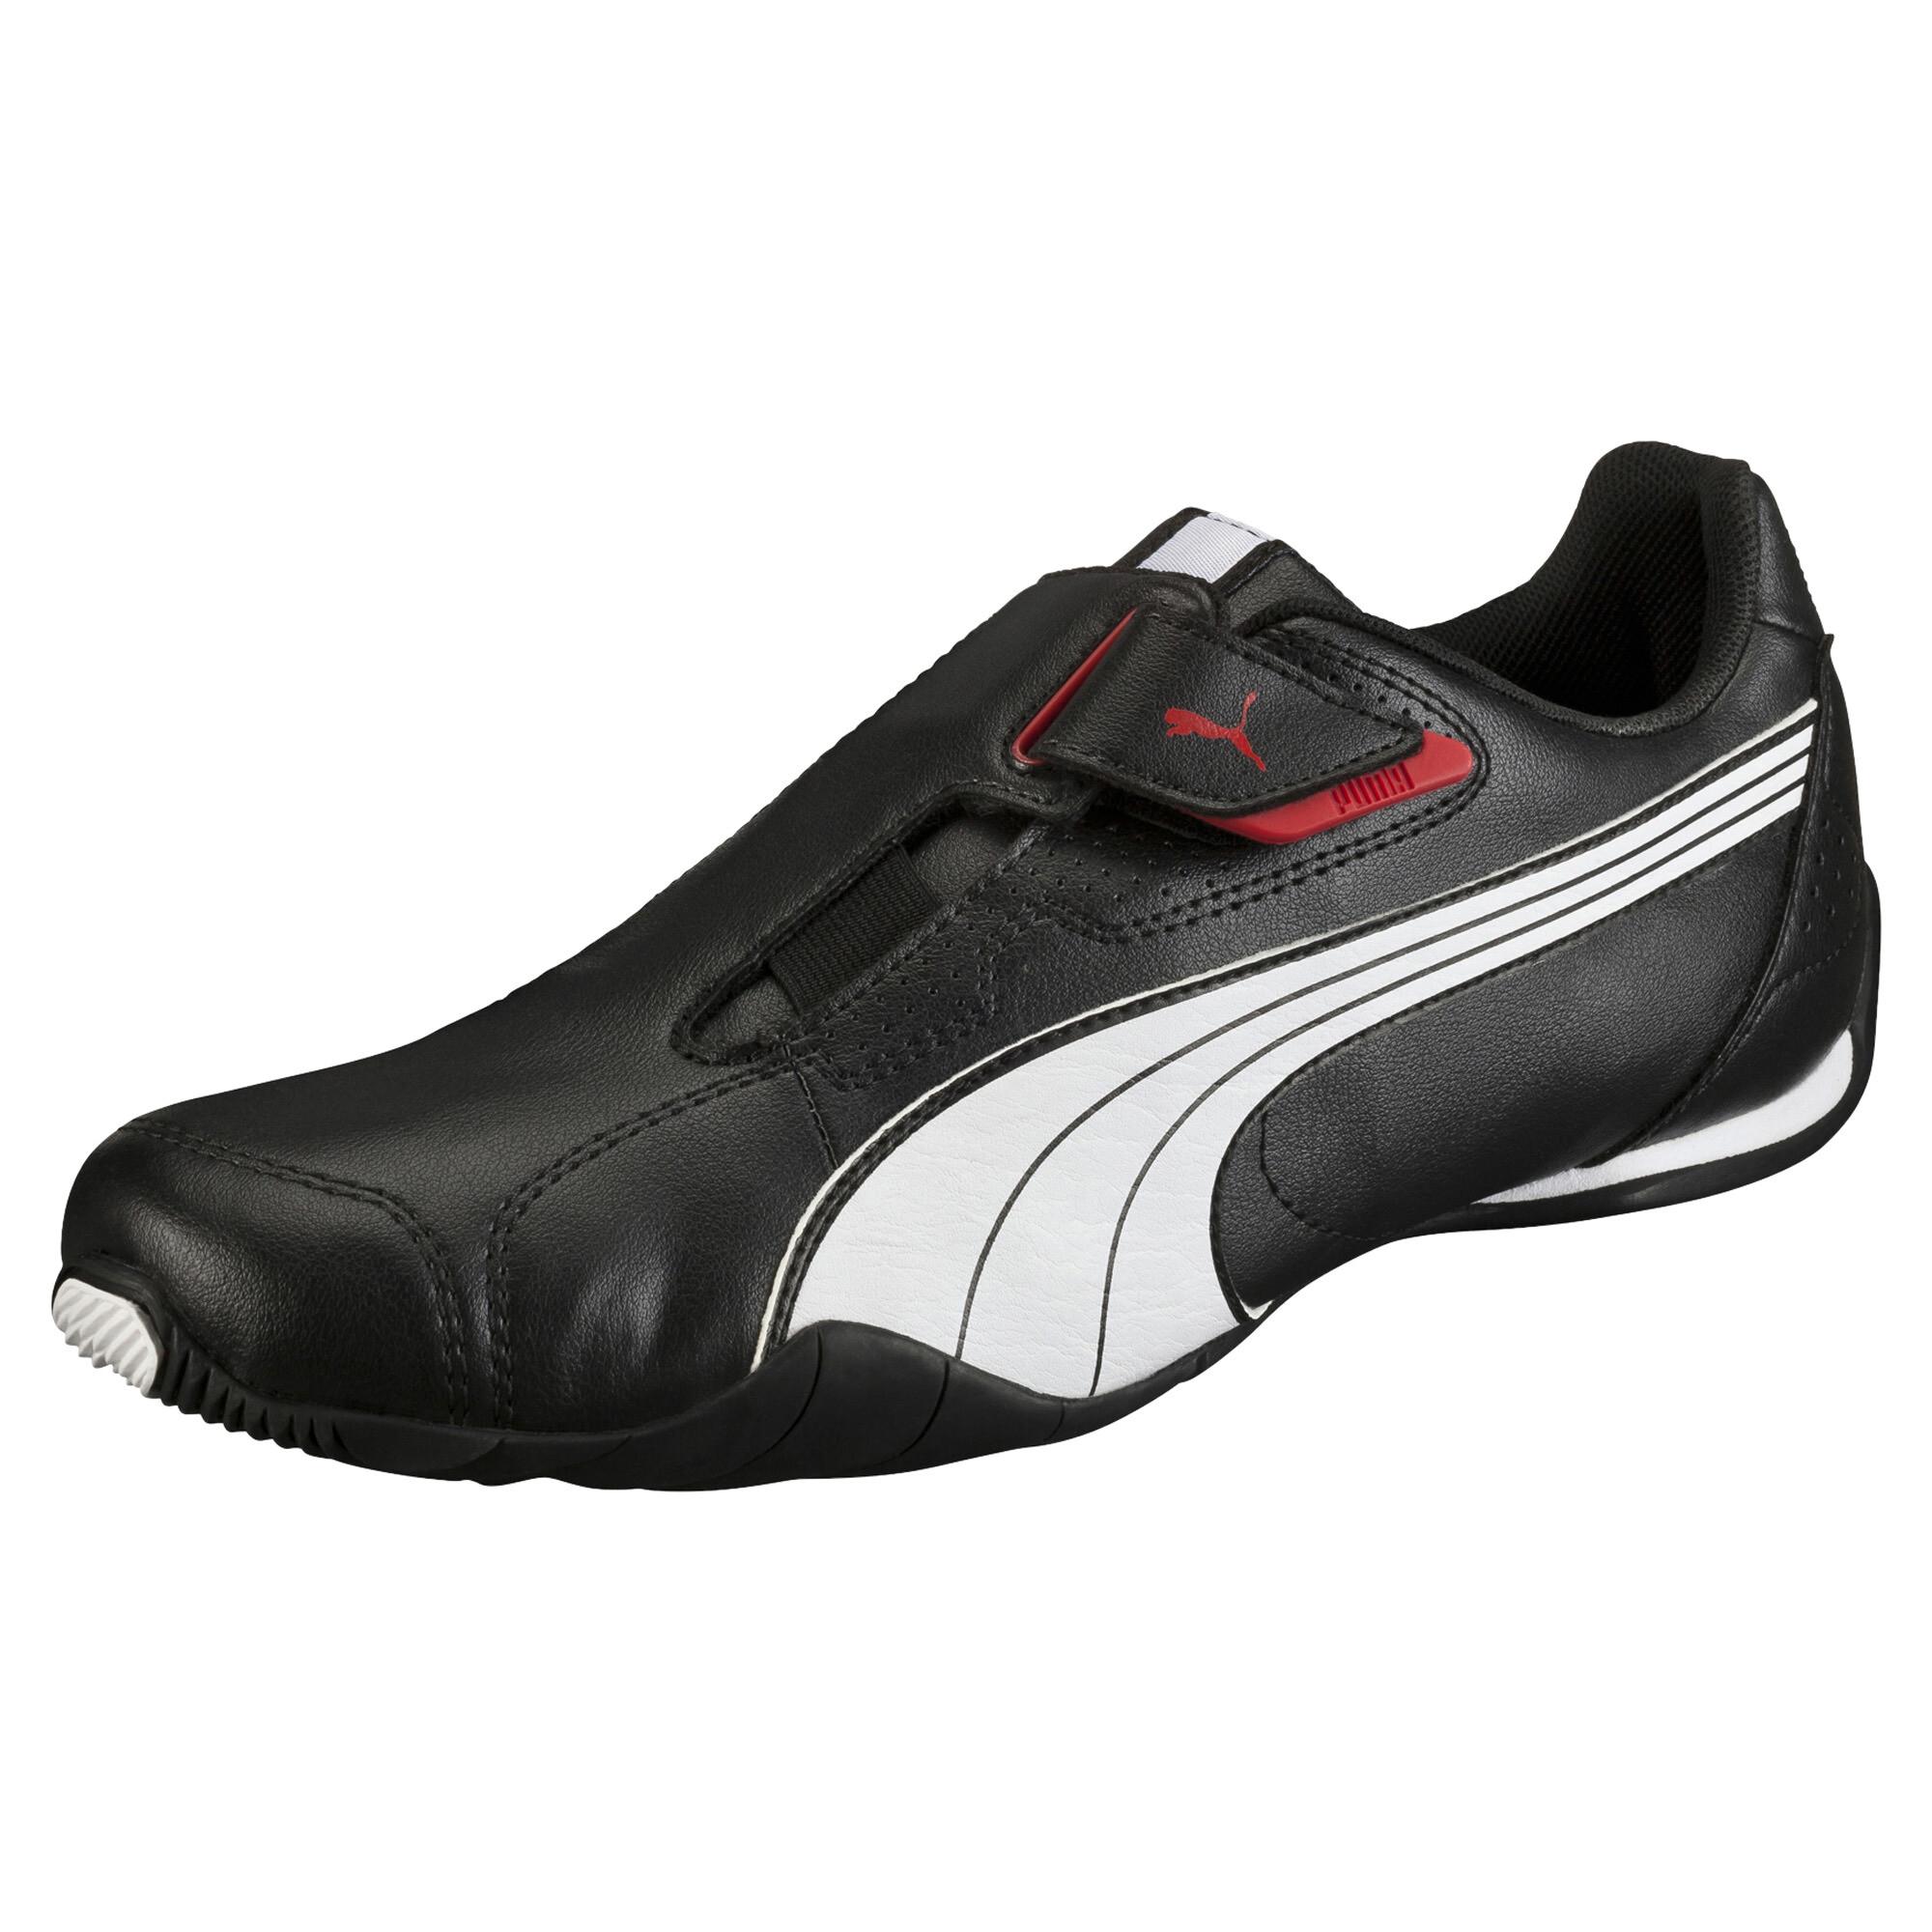 miniature 6 - Puma Men's Redon Move Shoes